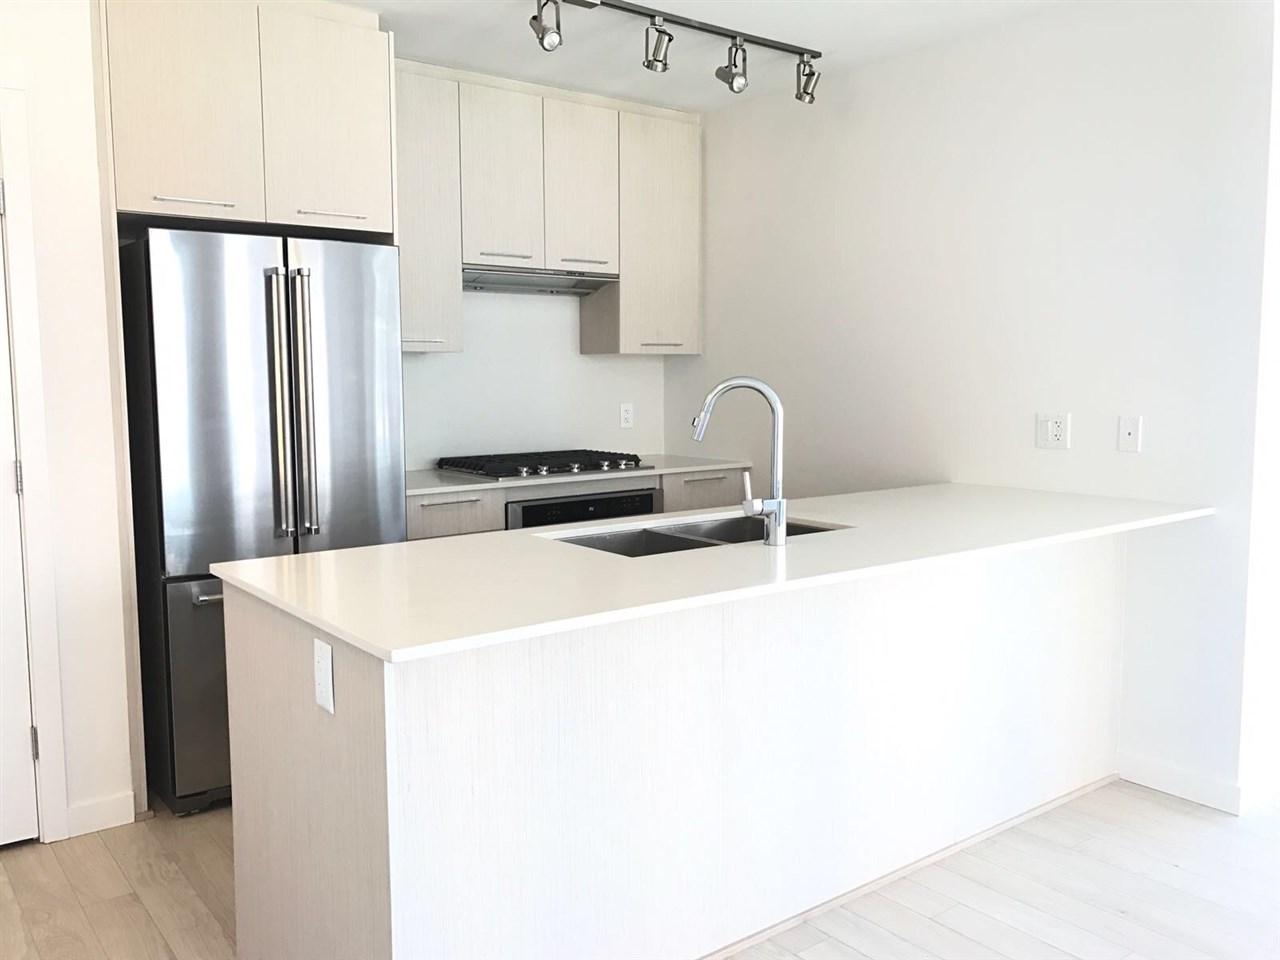 Condo Apartment at 509 5619 CEDARBRIDGE WAY, Unit 509, Richmond, British Columbia. Image 6